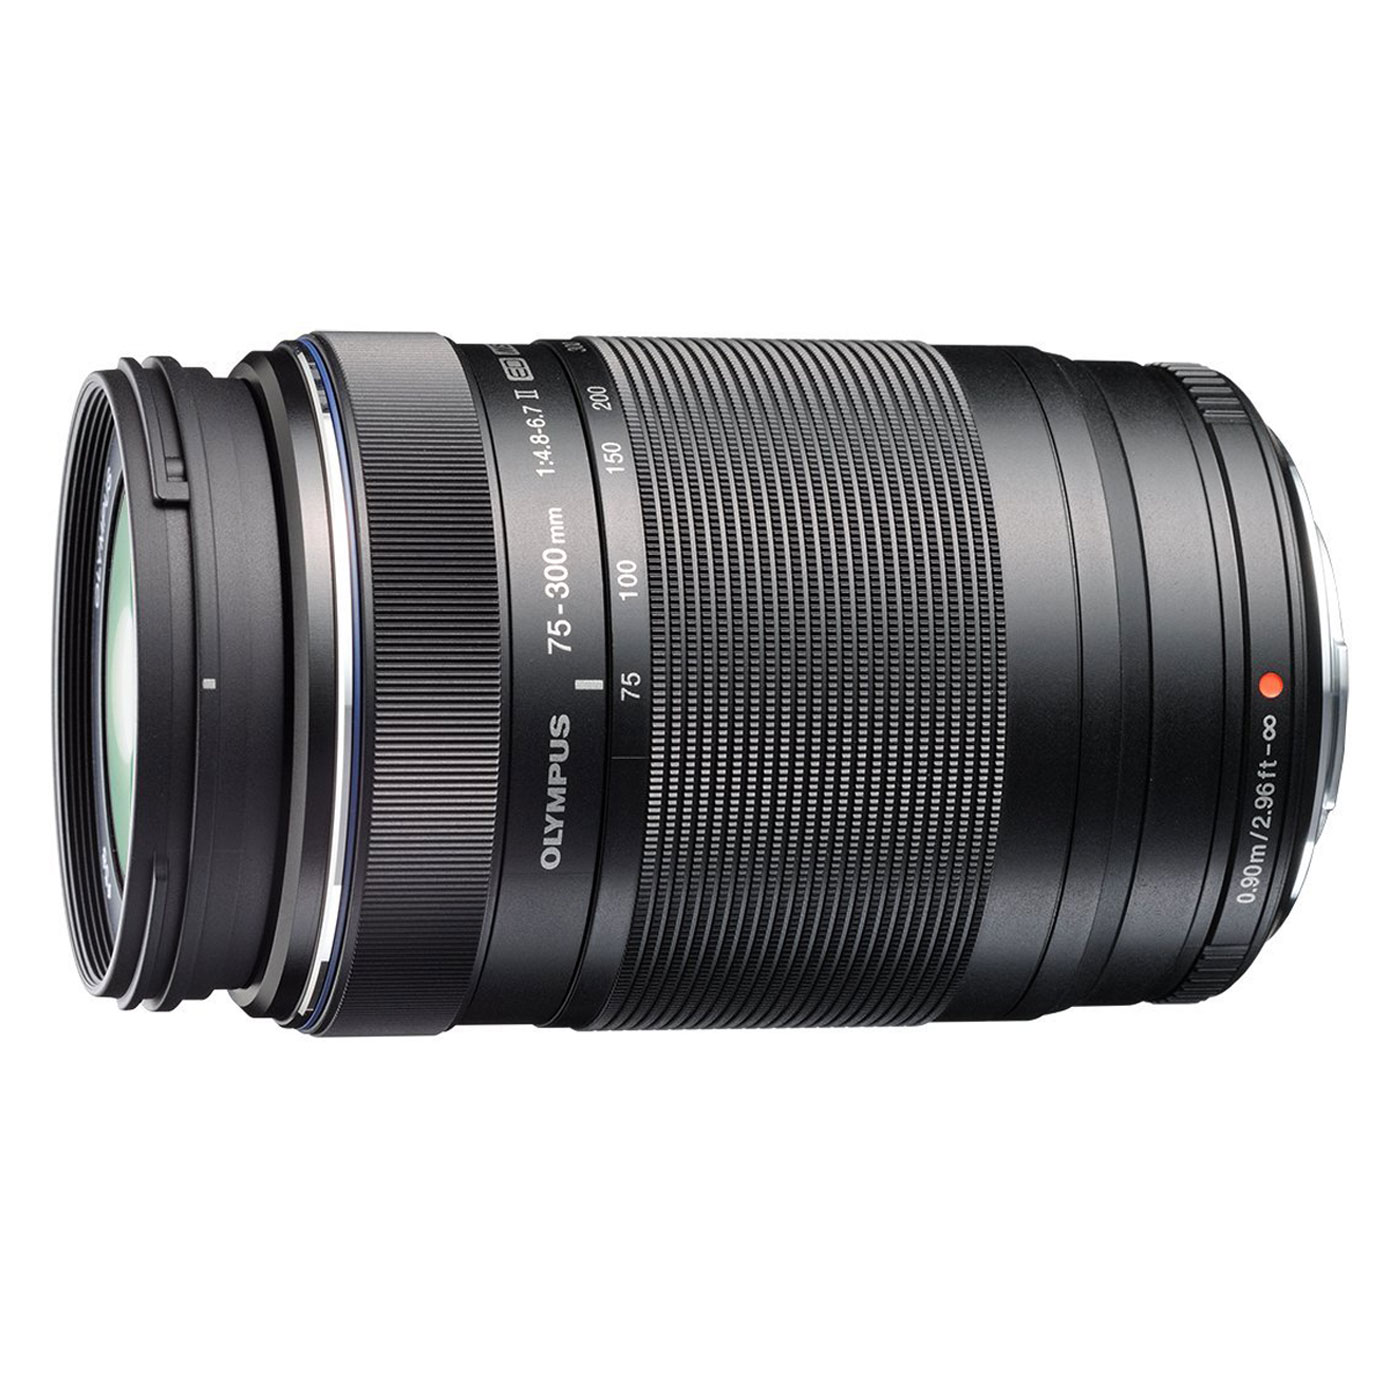 Objectif appareil photo Olympus M.ZUIKO DIGITAL ED 75-300mm II 1:4.8-6.7 Téléobjectif compact 70 x116 mm